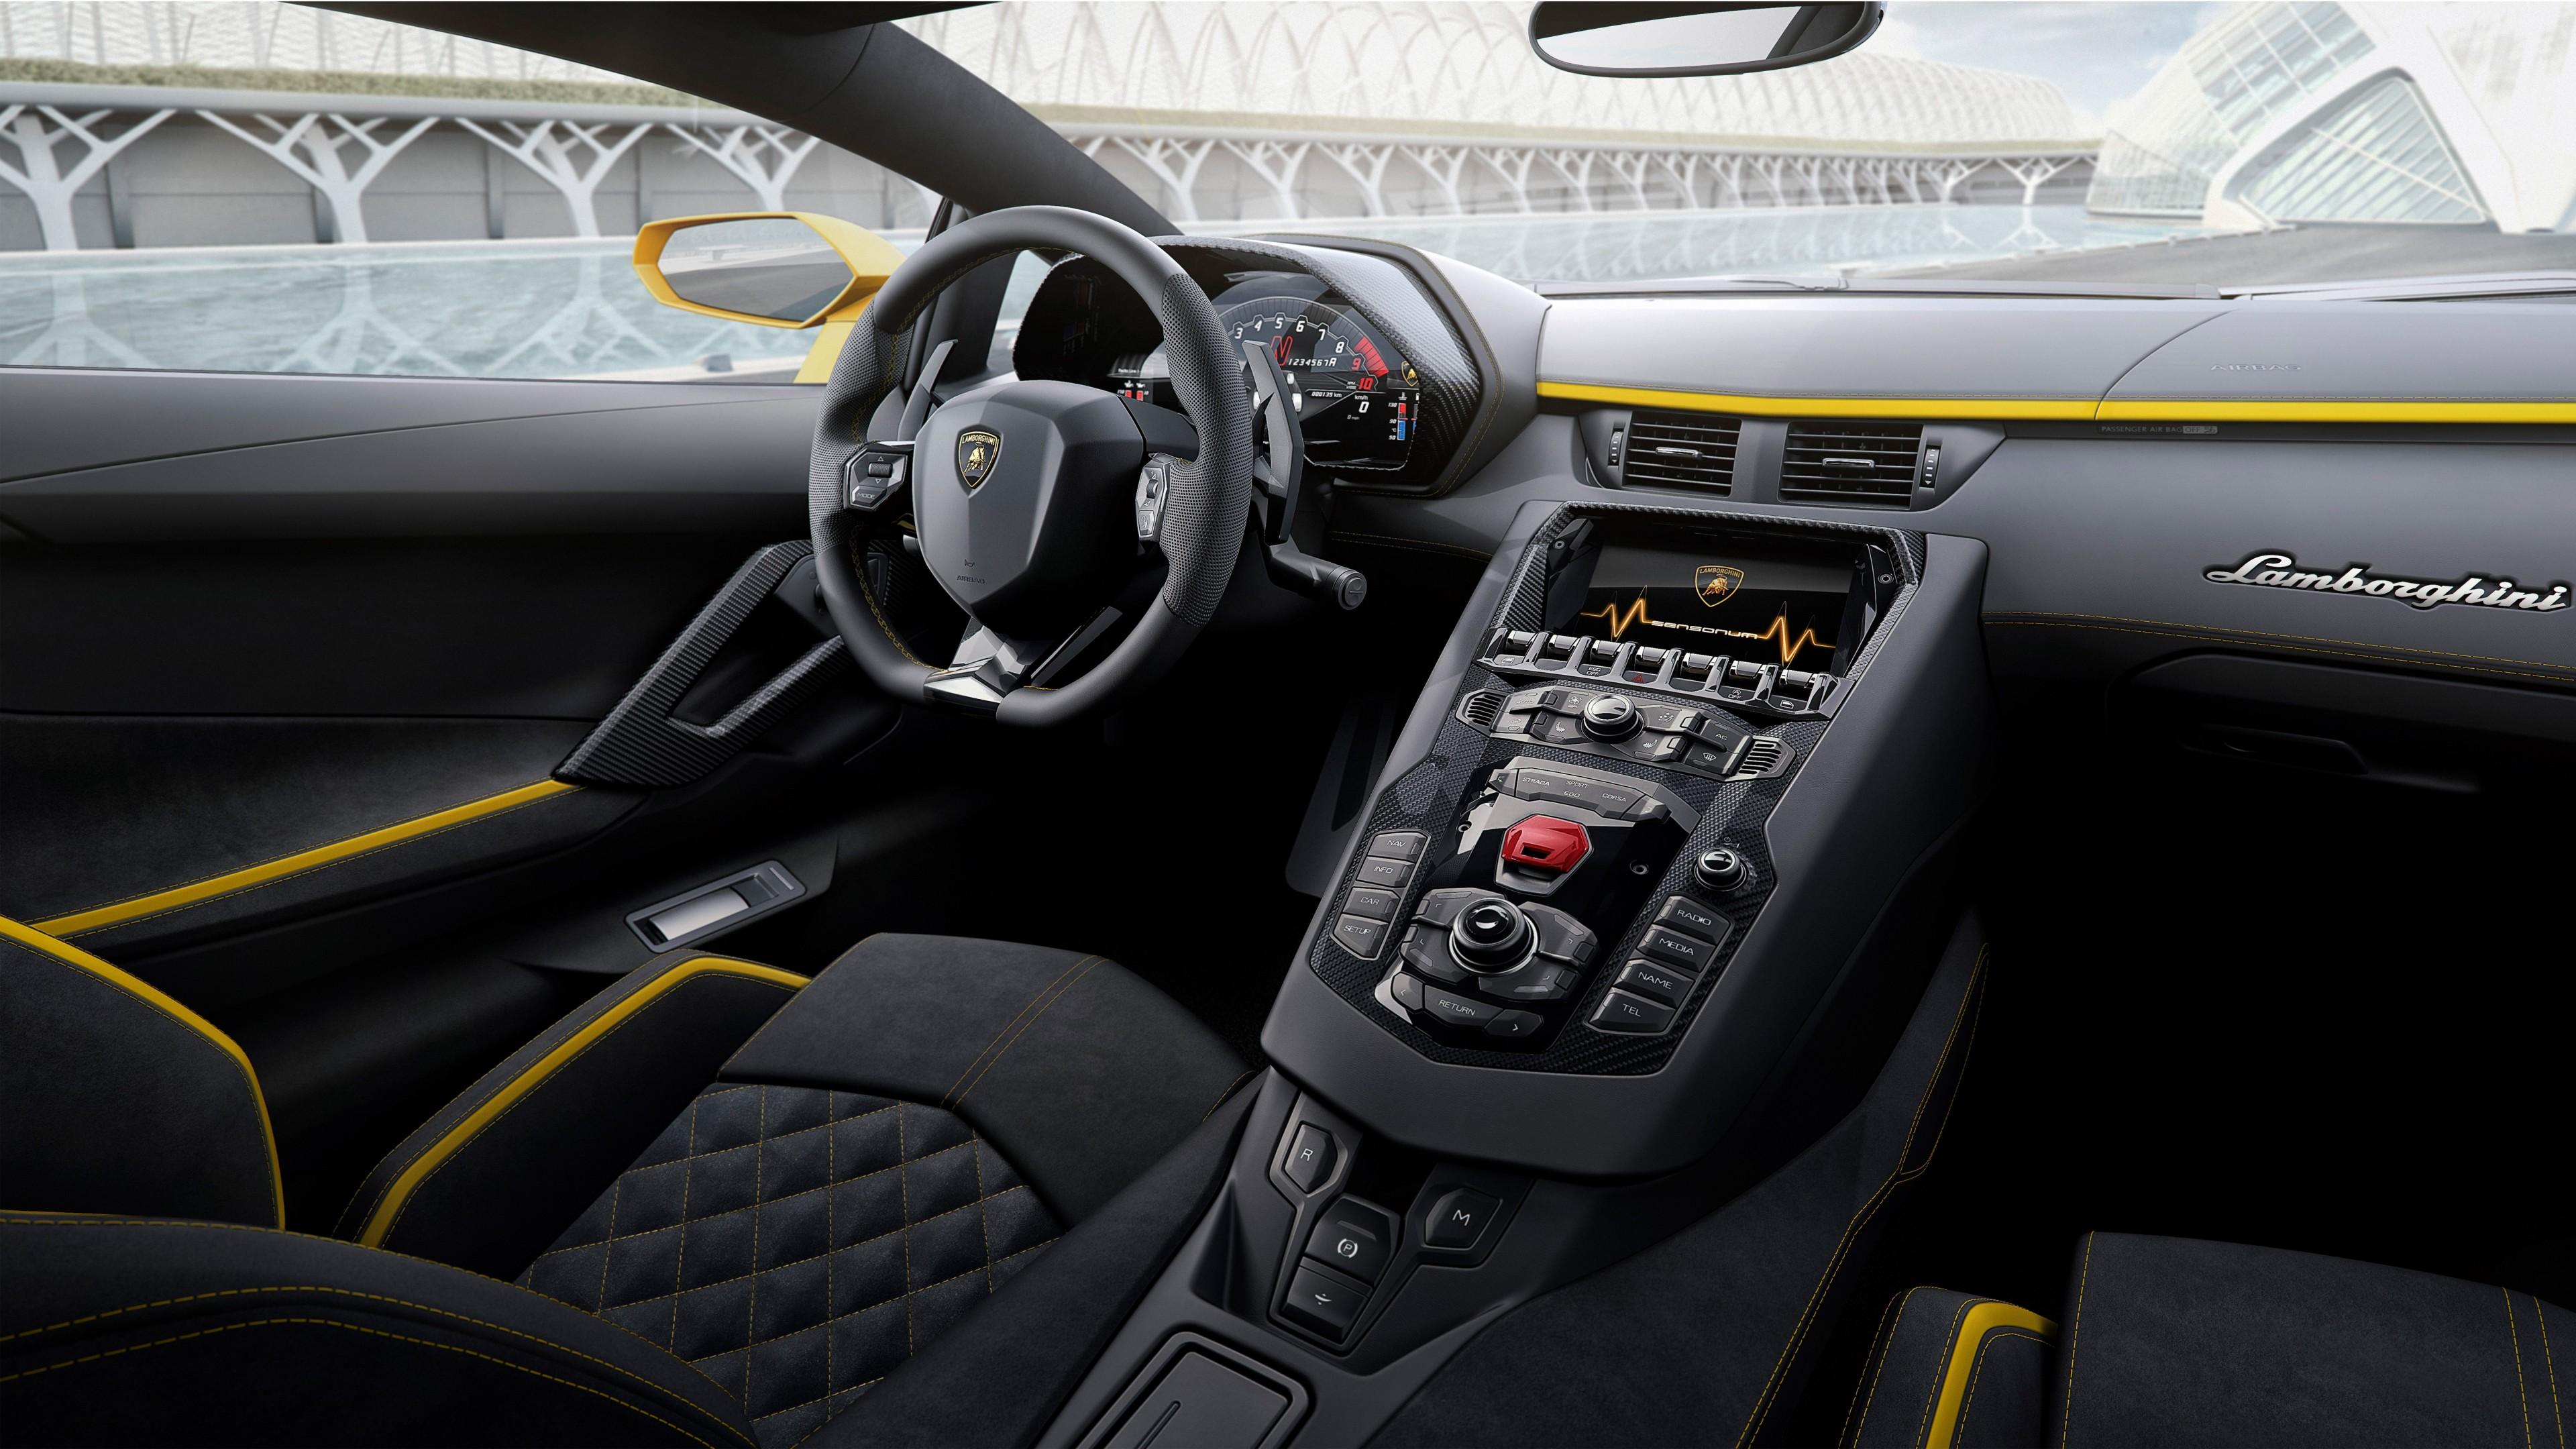 2017 Lamborghini Aventador S Interior Wallpaper Hd Car Wallpapers Id 7277